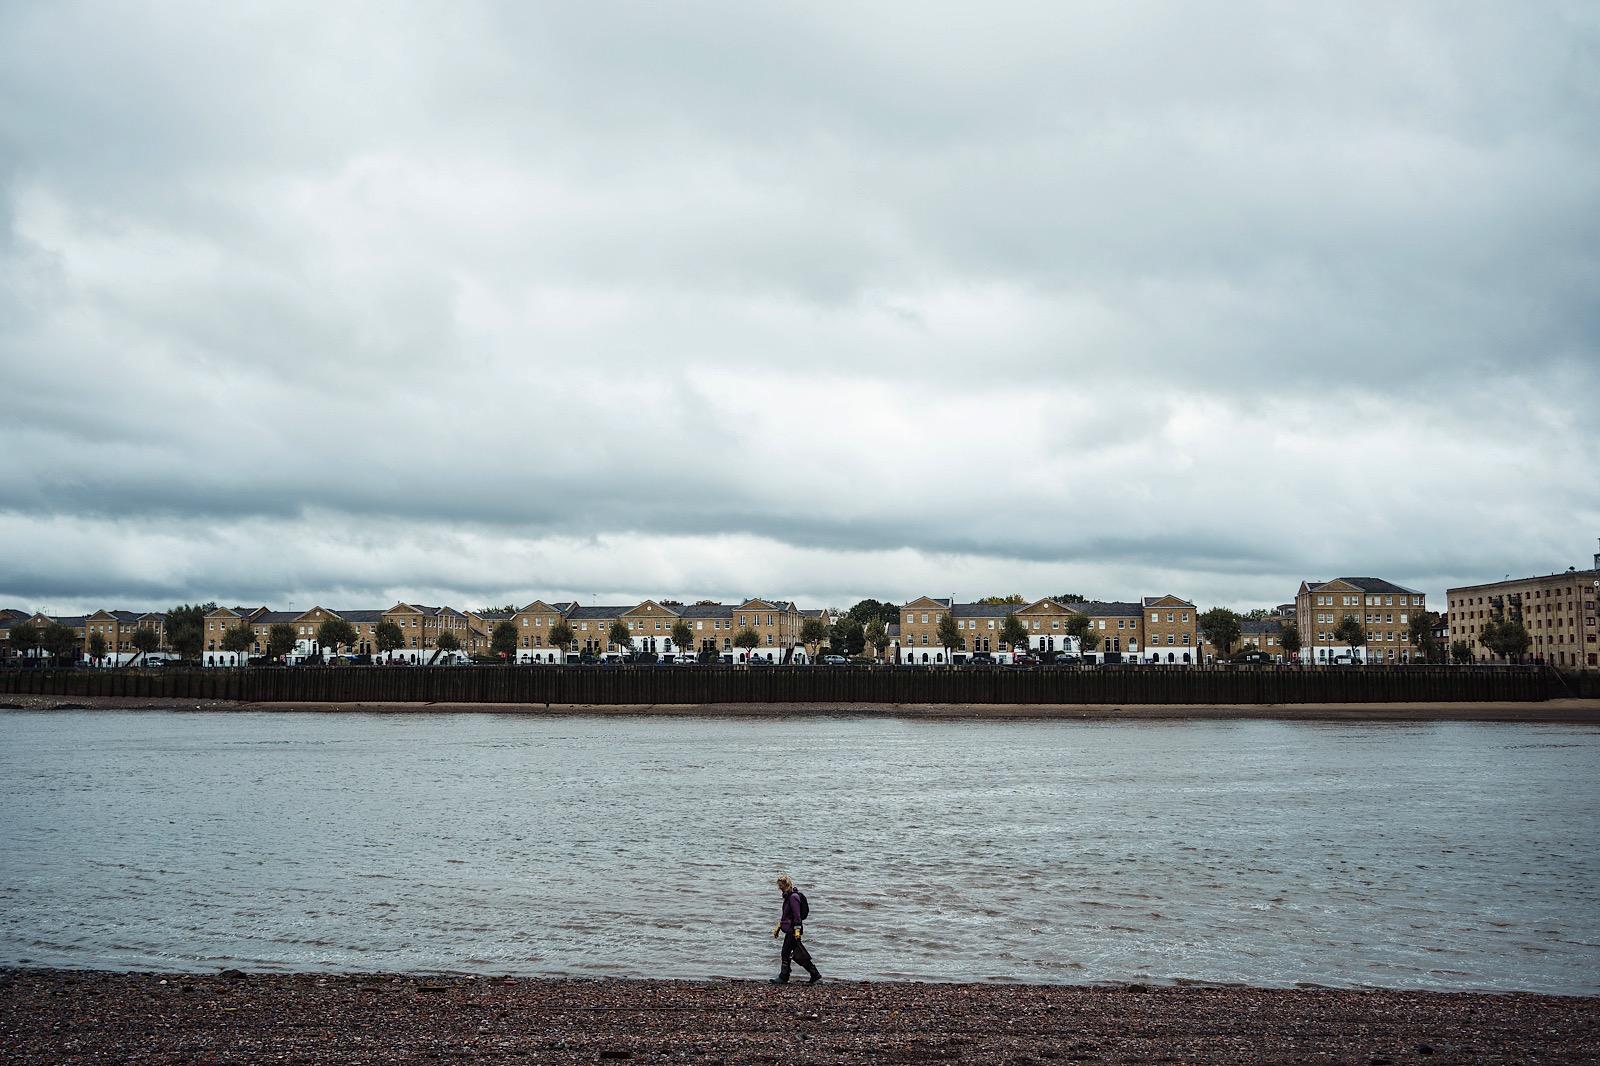 Mudlarker walking along shore of River Thames